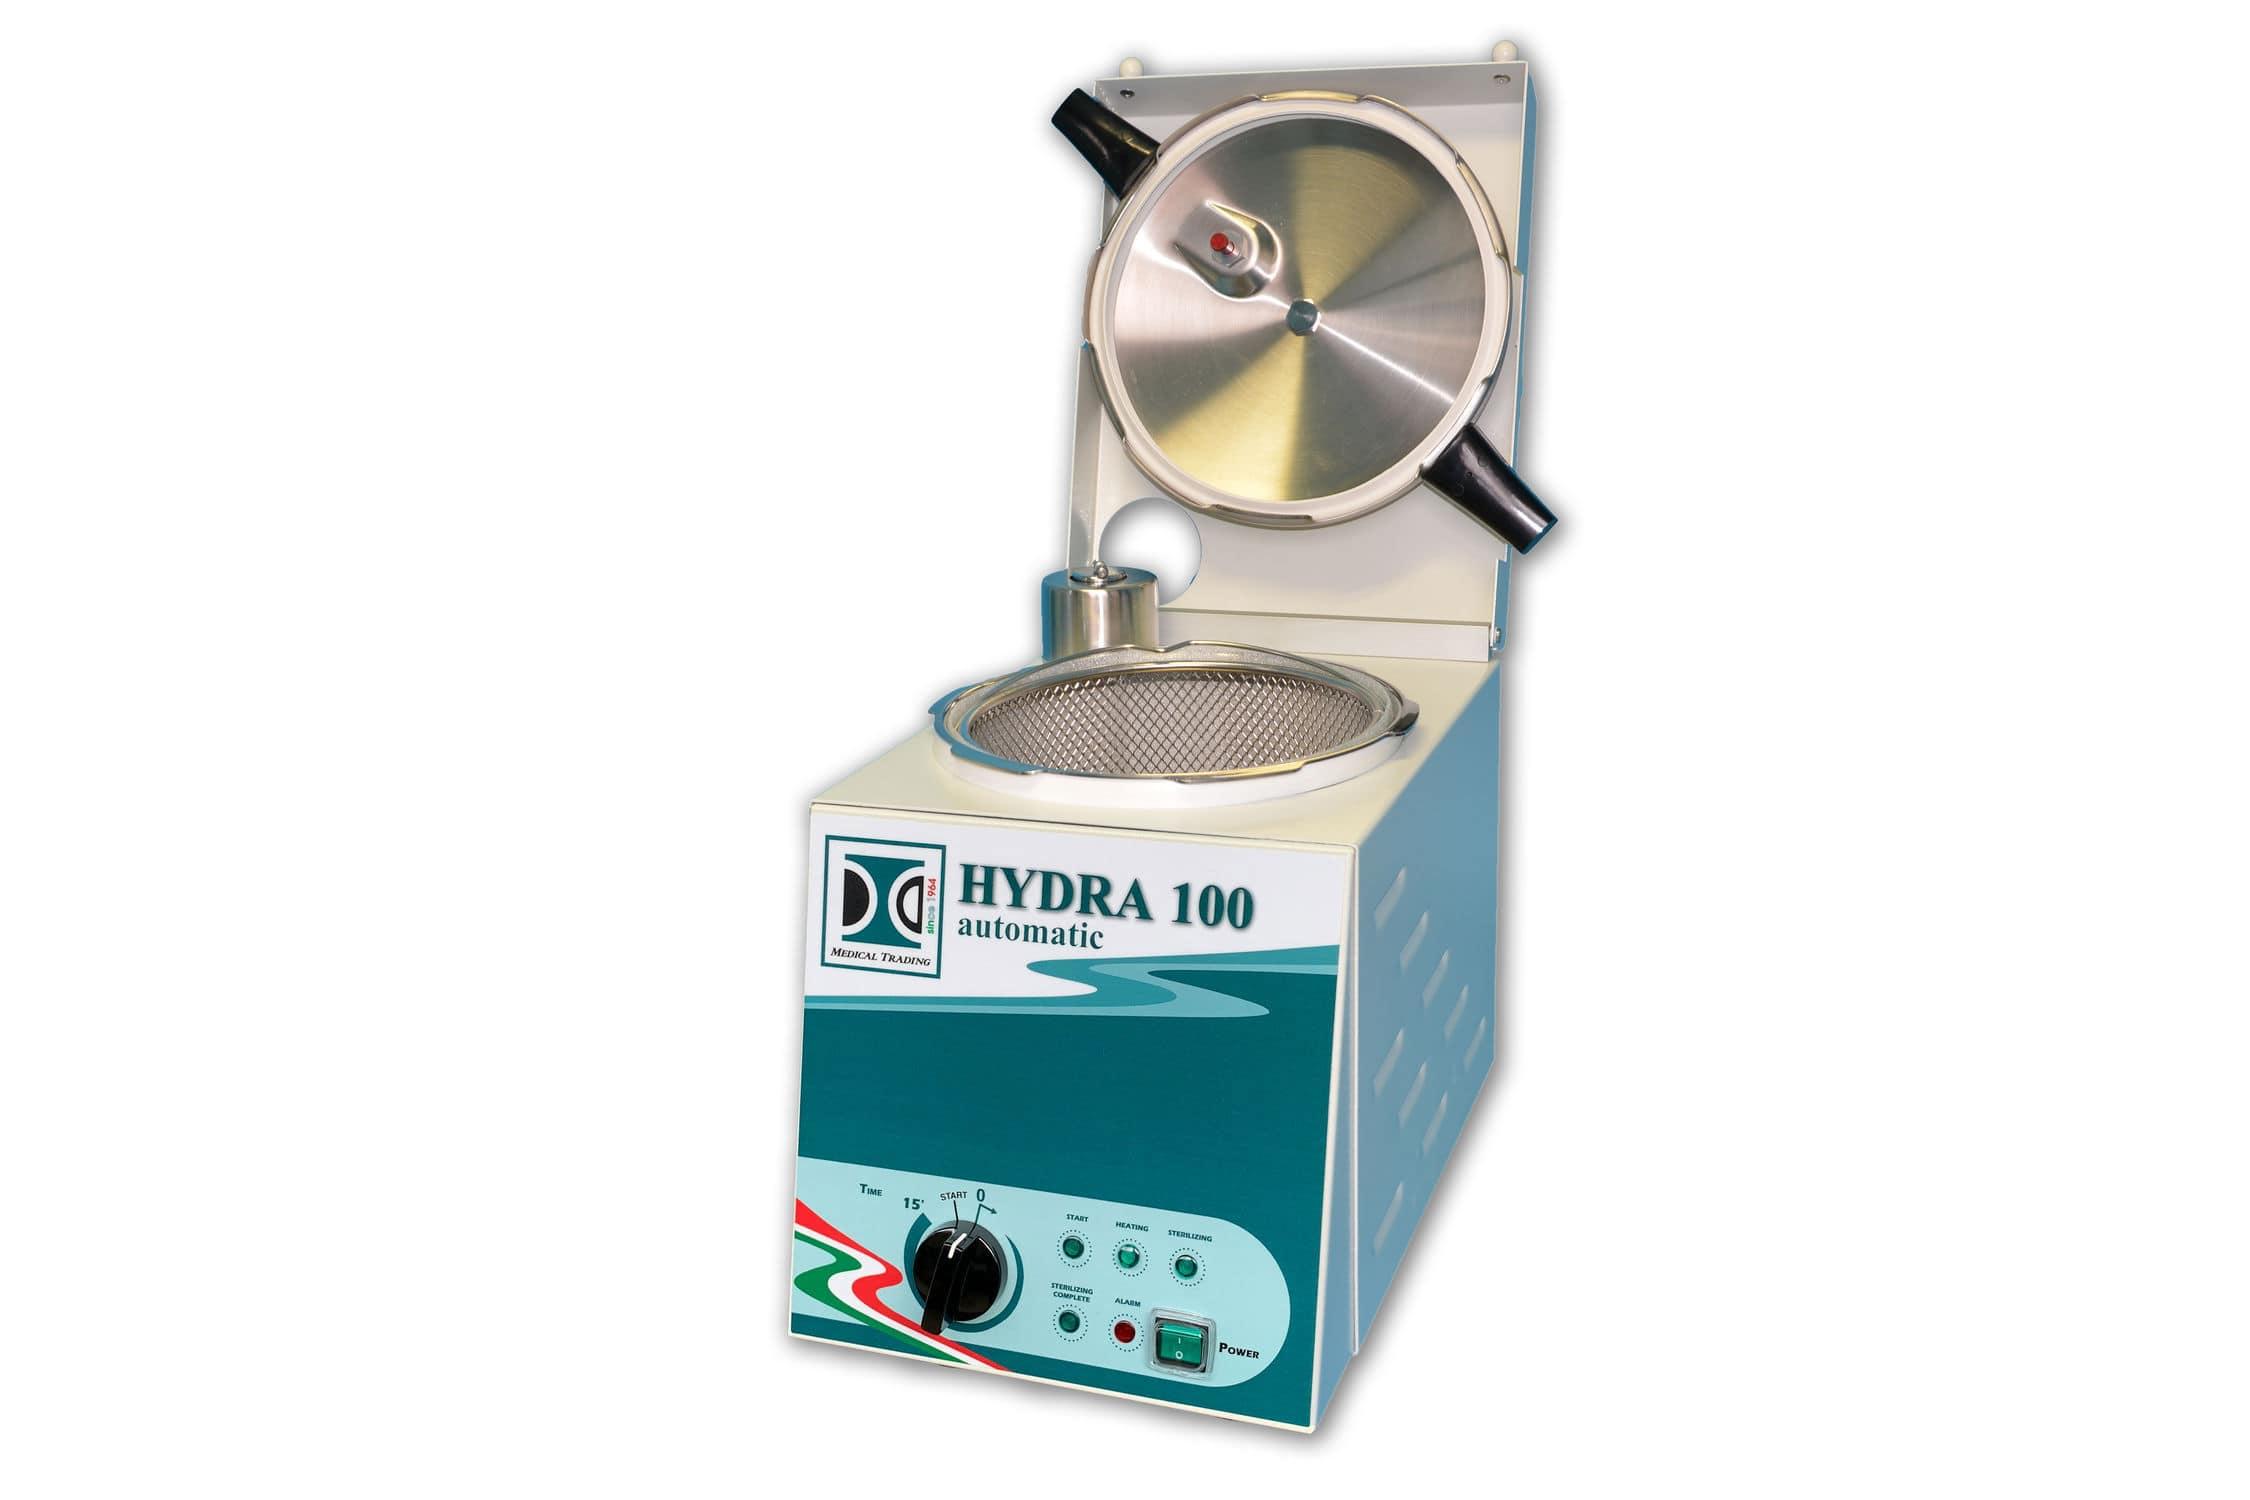 Autoclave - Hydra 100 Automatic